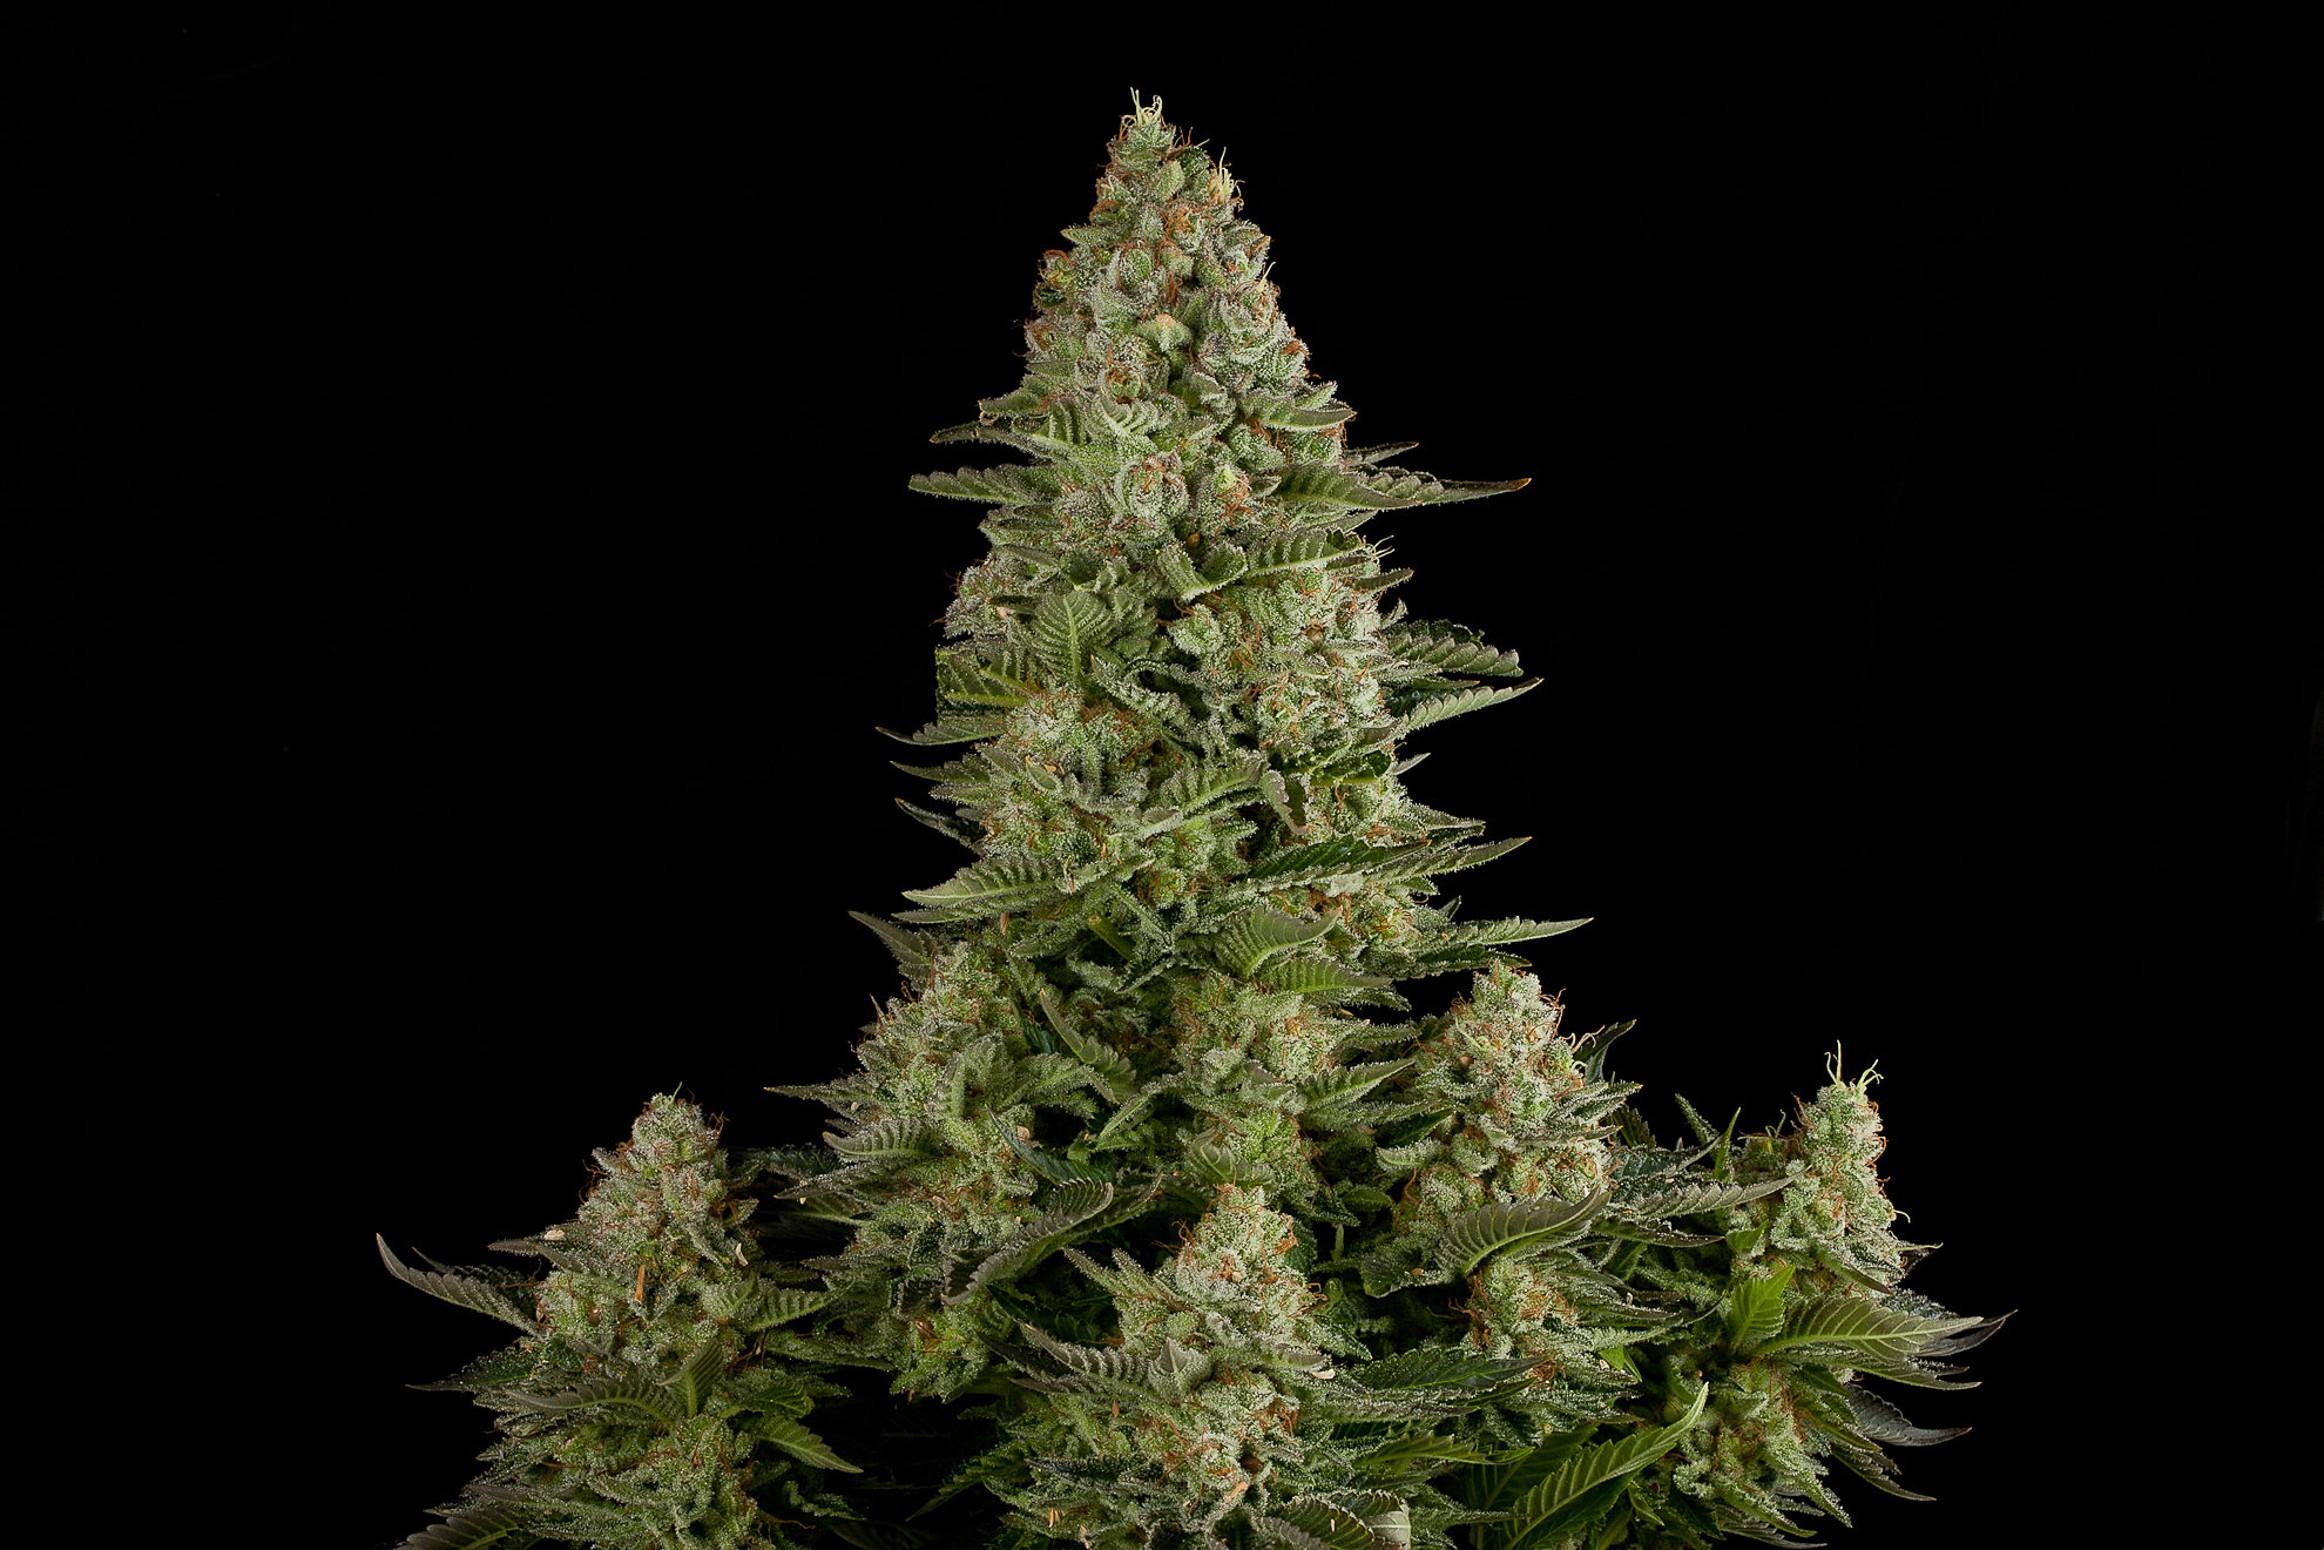 White widow plant height